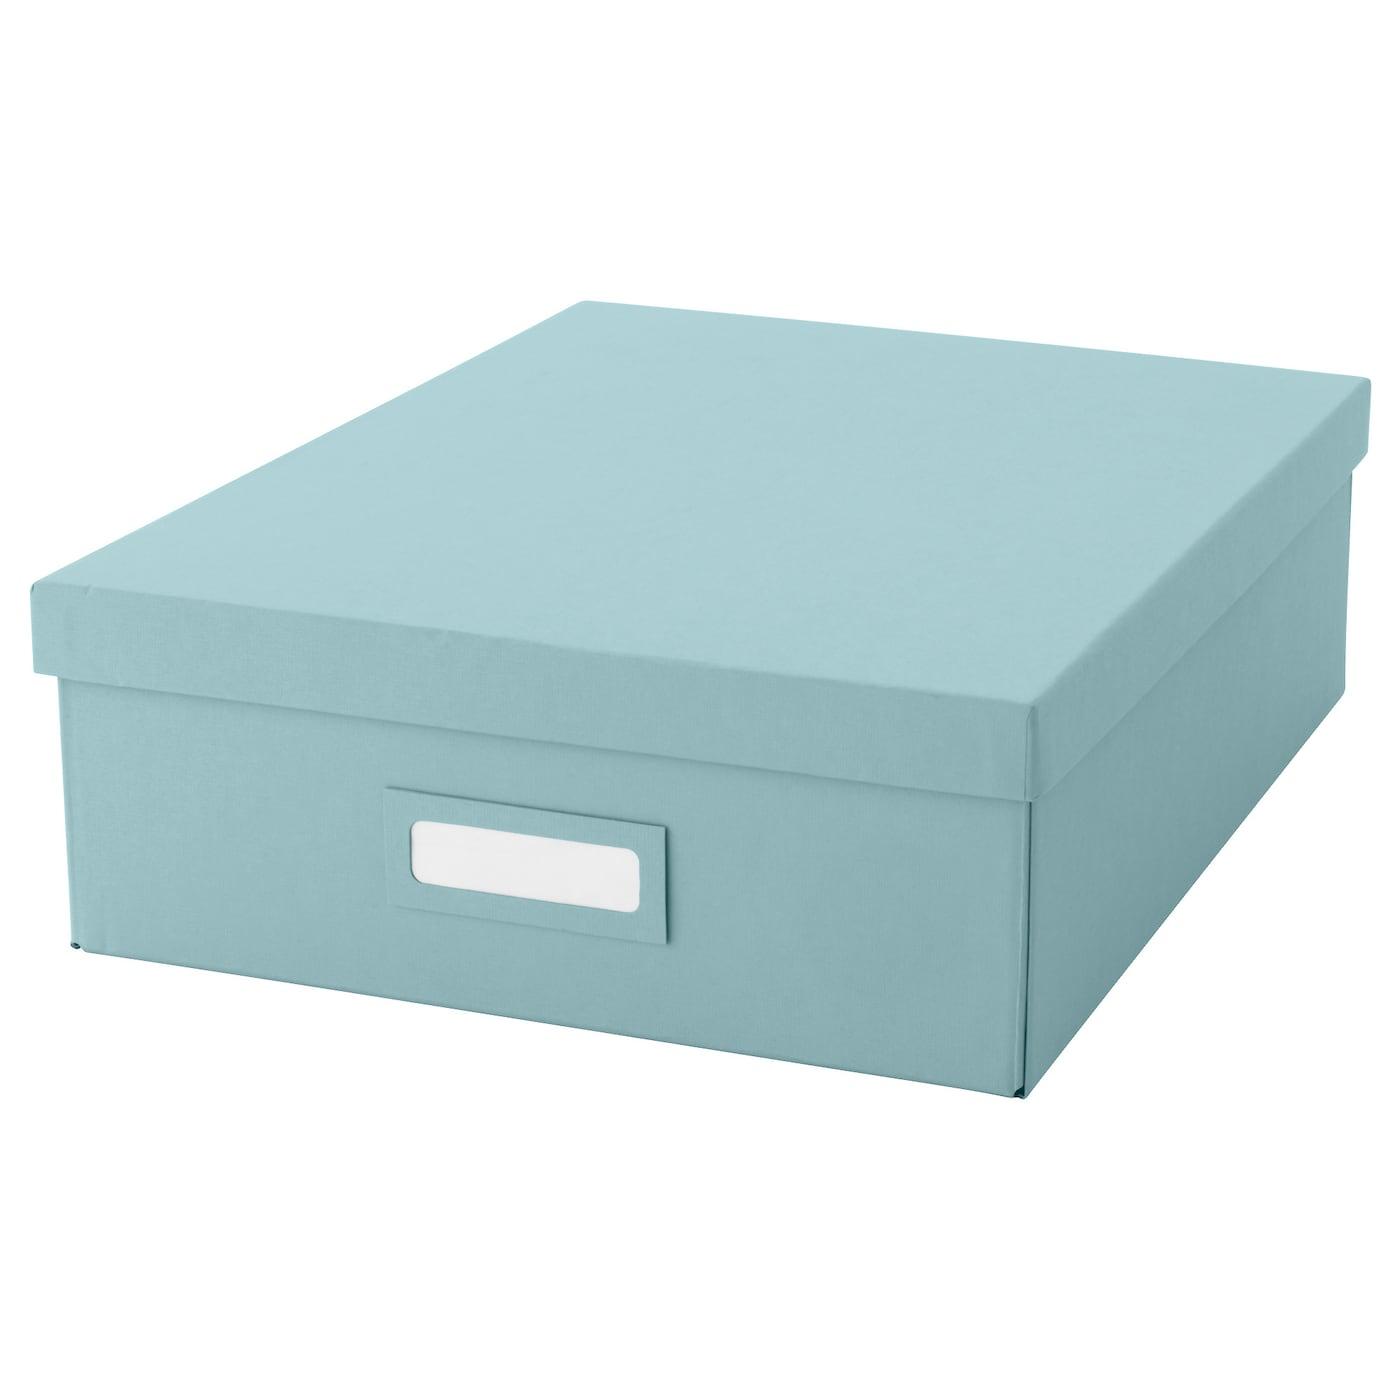 tjena box with compartments light blue 27x35x10 cm ikea